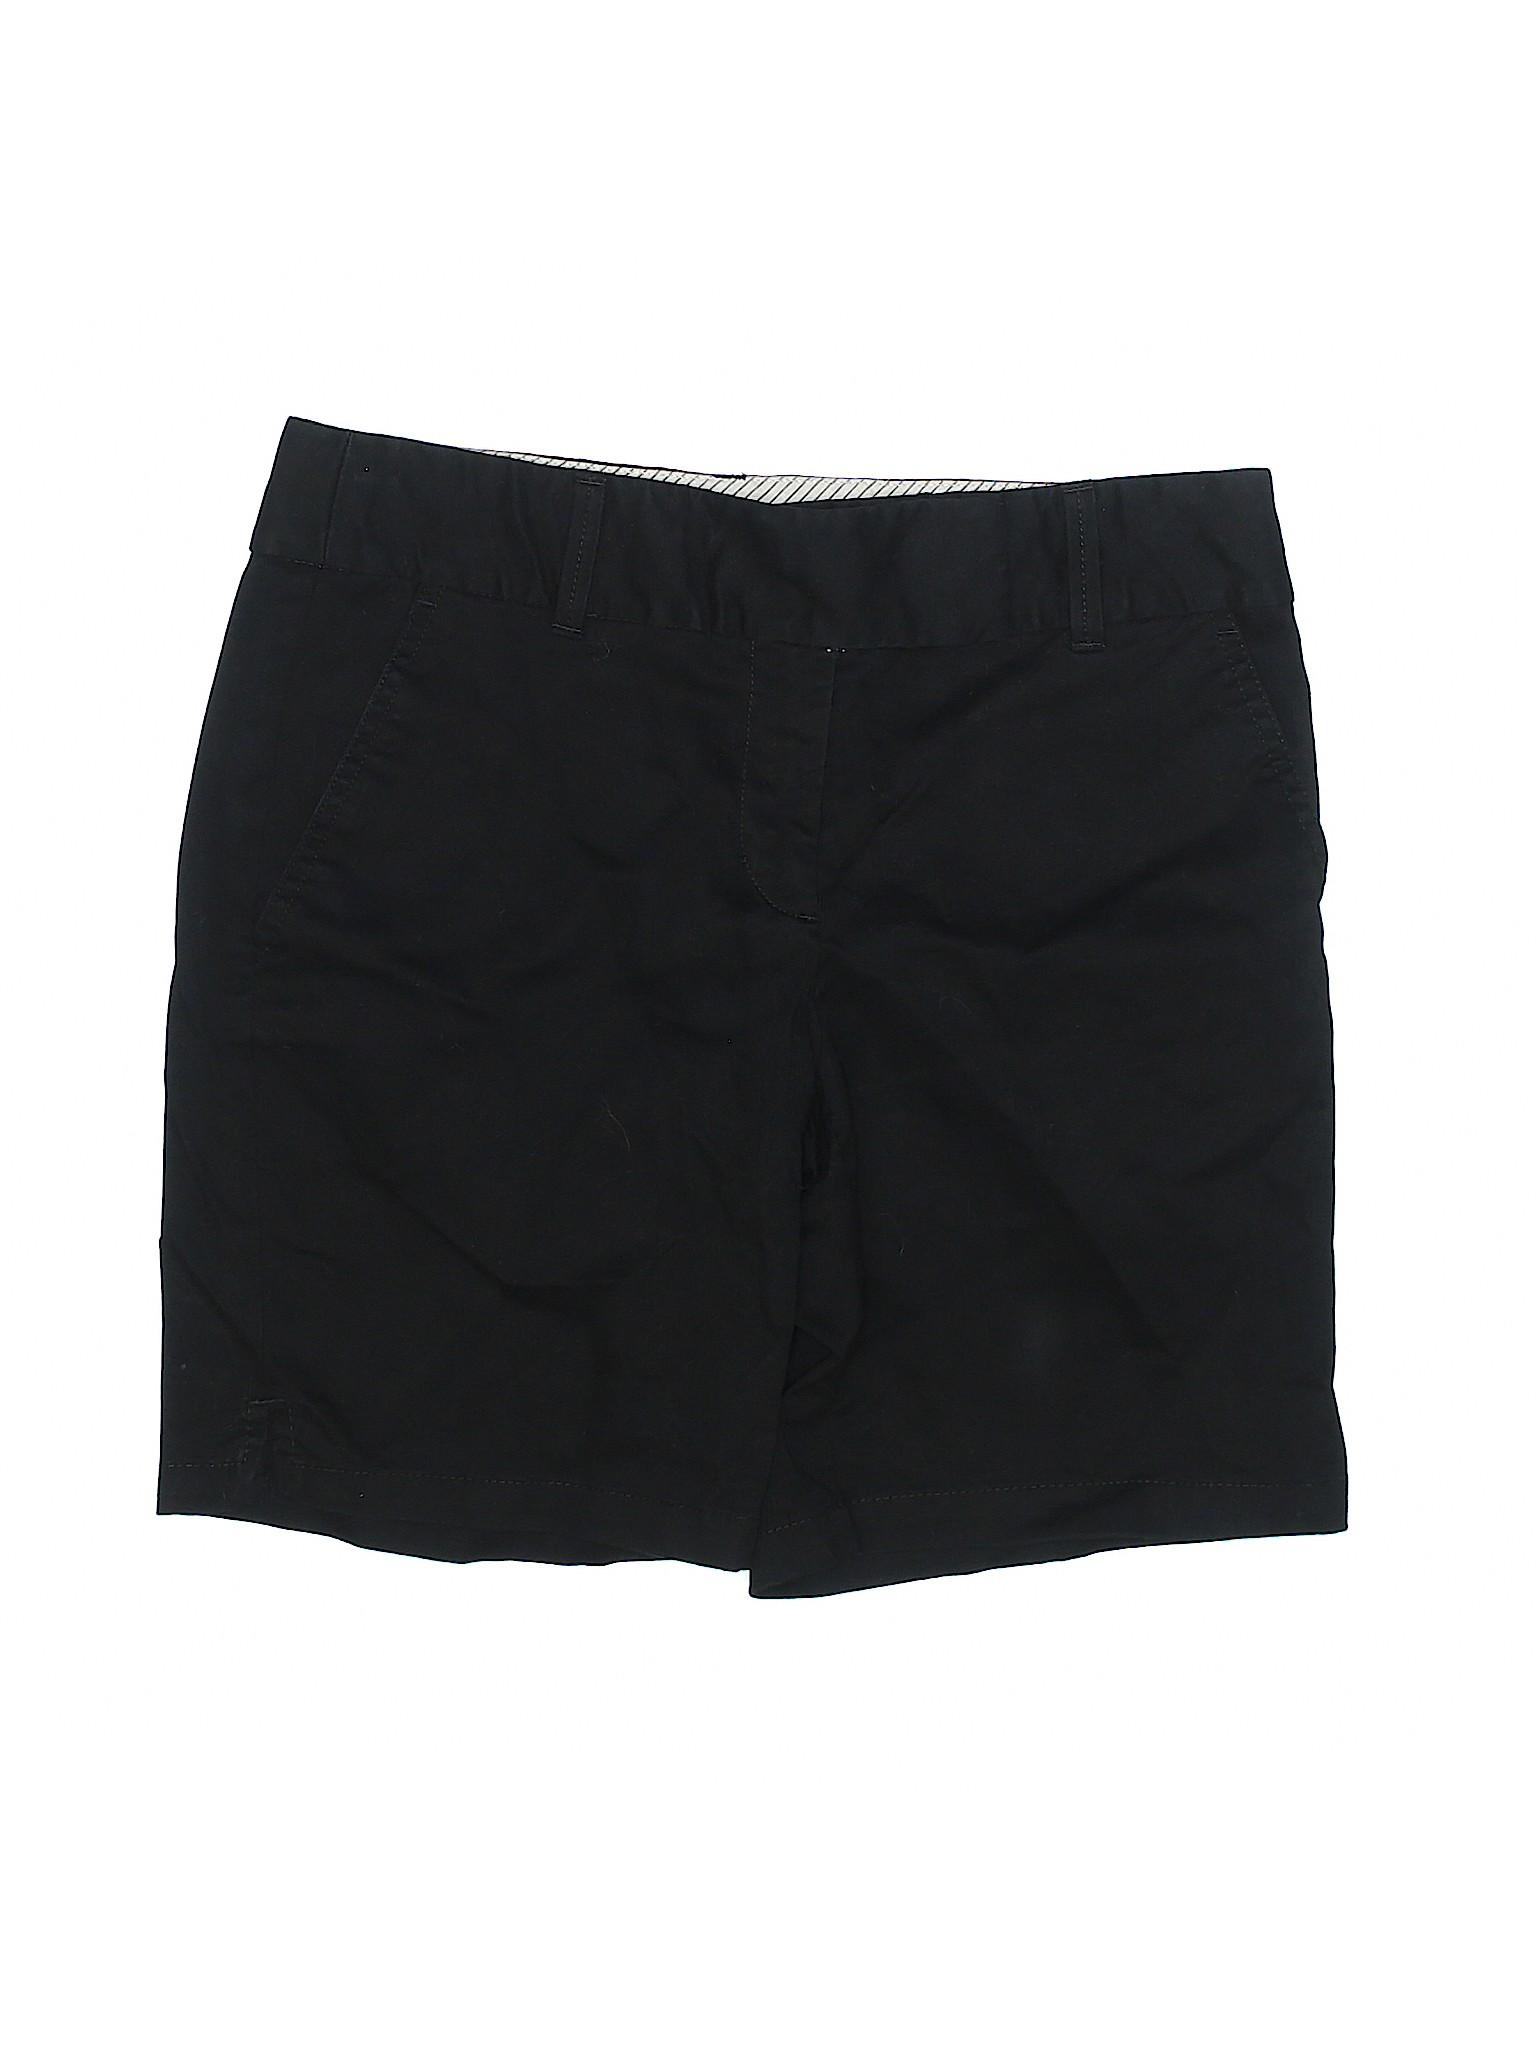 Taylor Ann Shorts Khaki LOFT Boutique ZCwTzq